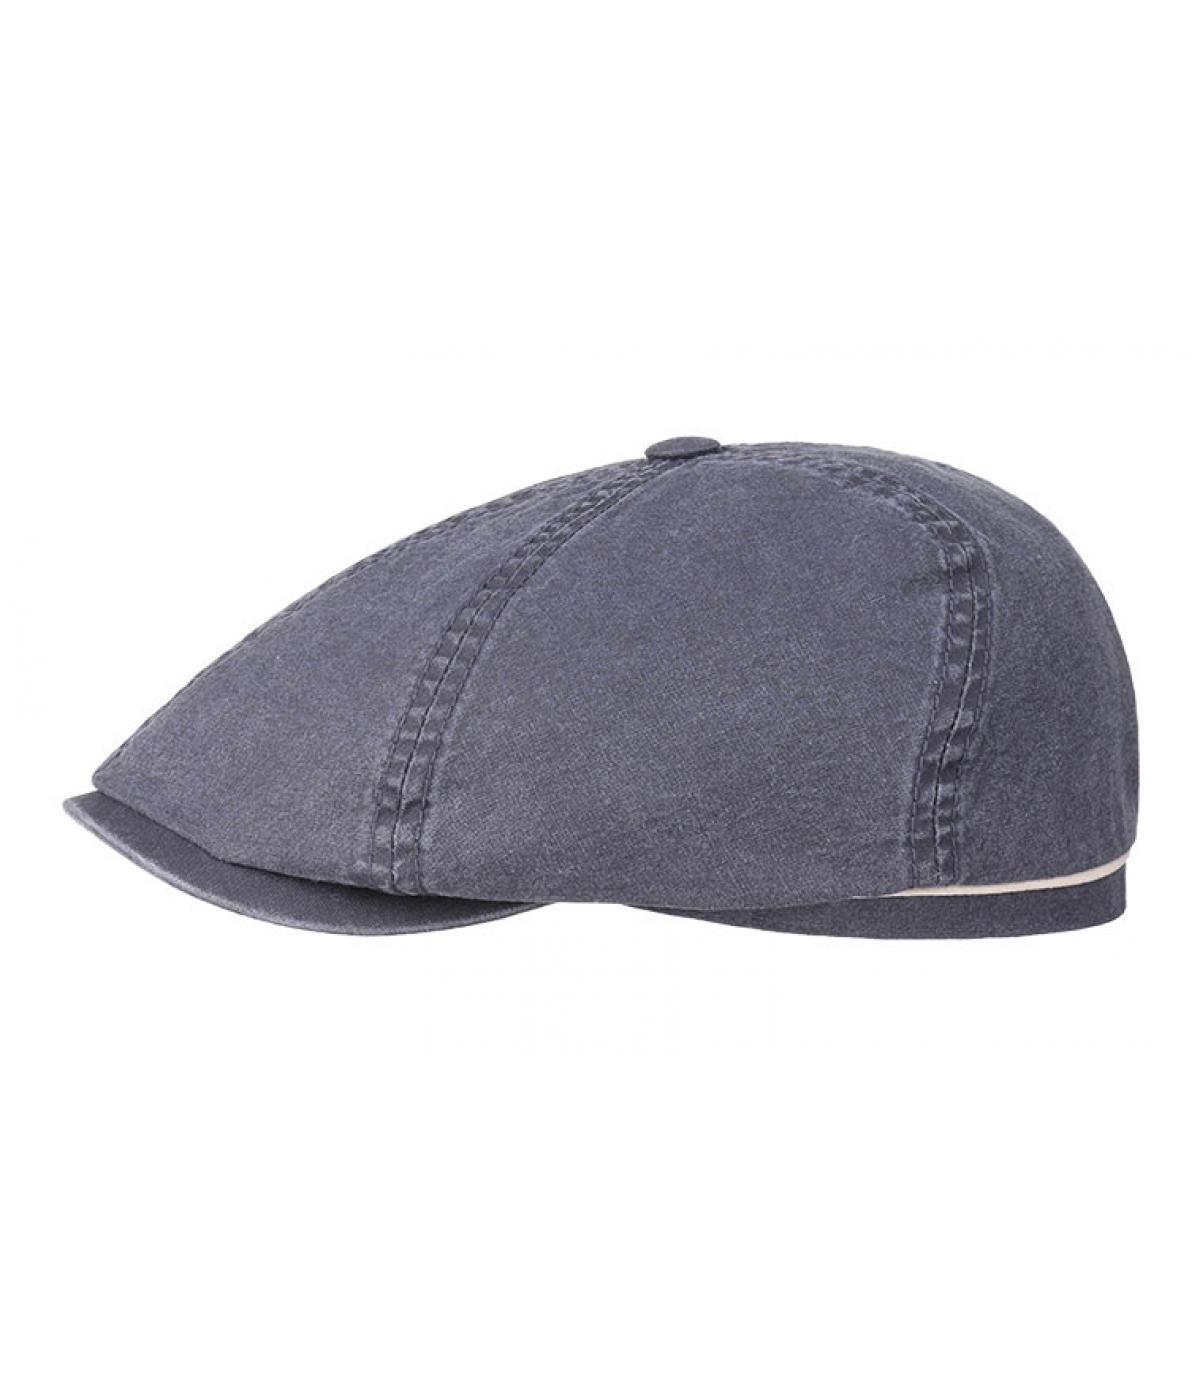 Détails Brooklyn cap waxed cotton organic blue - image 2